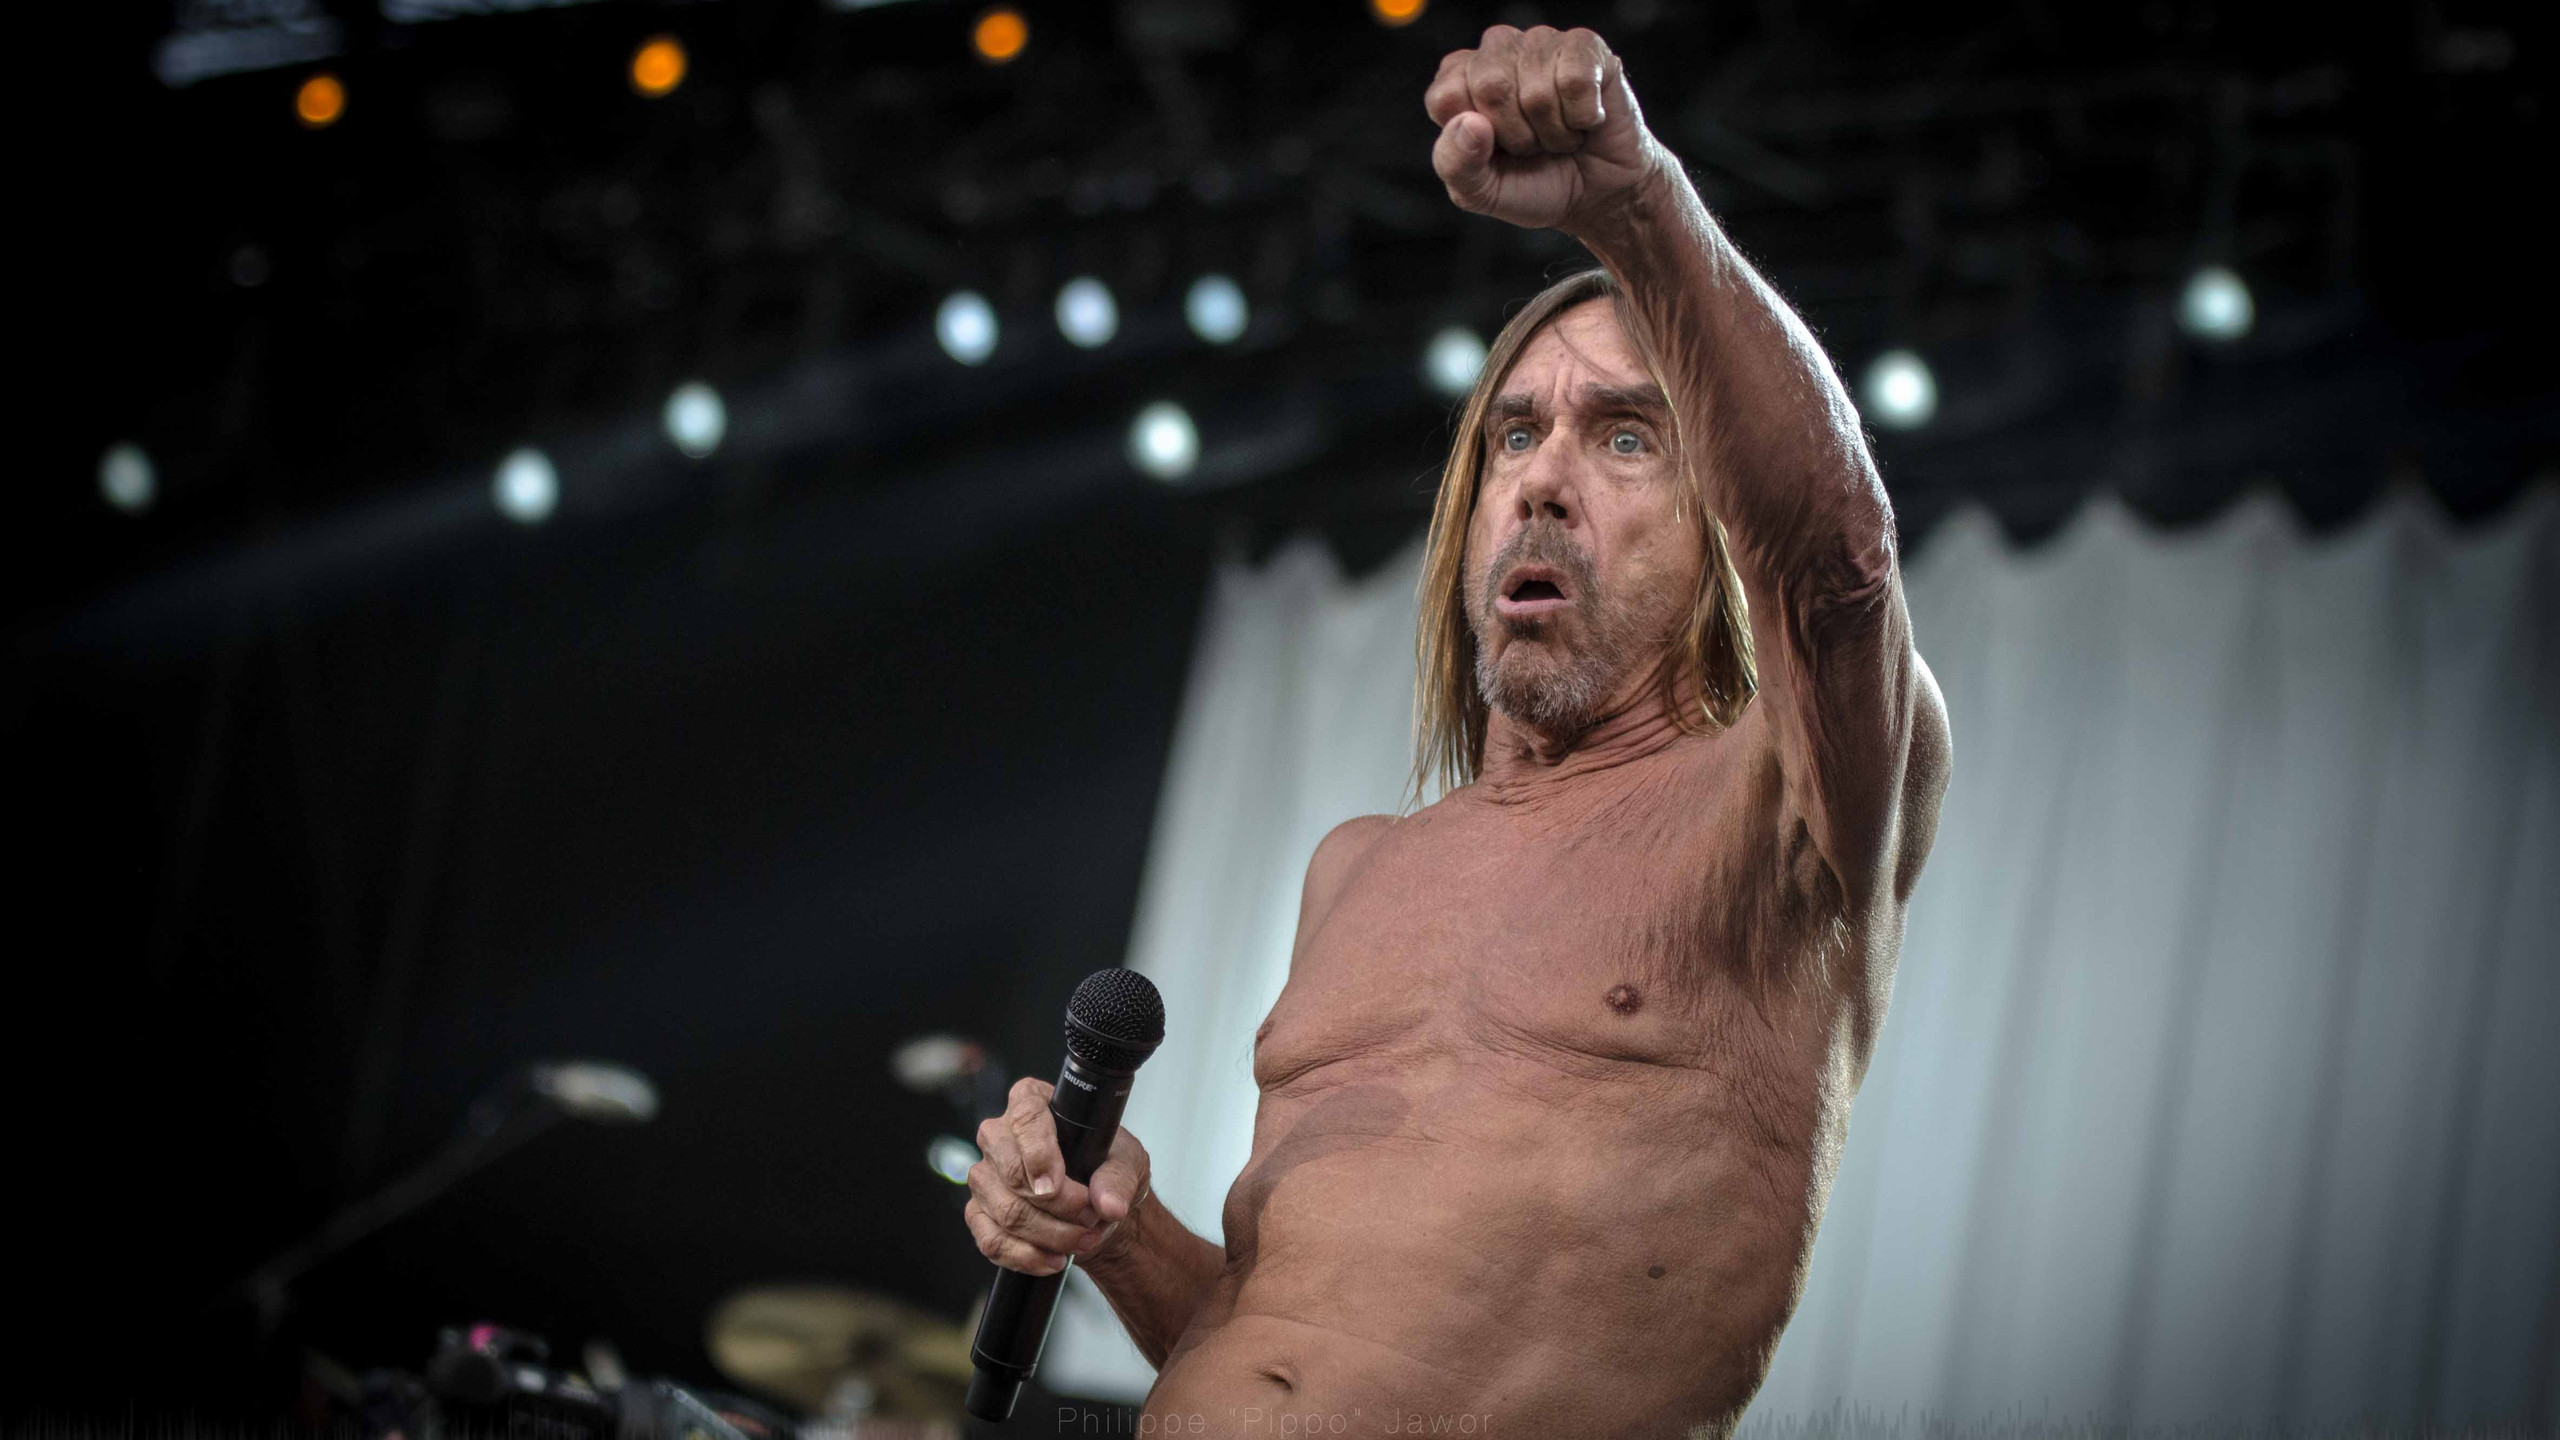 The American rock artist Iggy Pop, at Rock en Seine festival, August 2016.